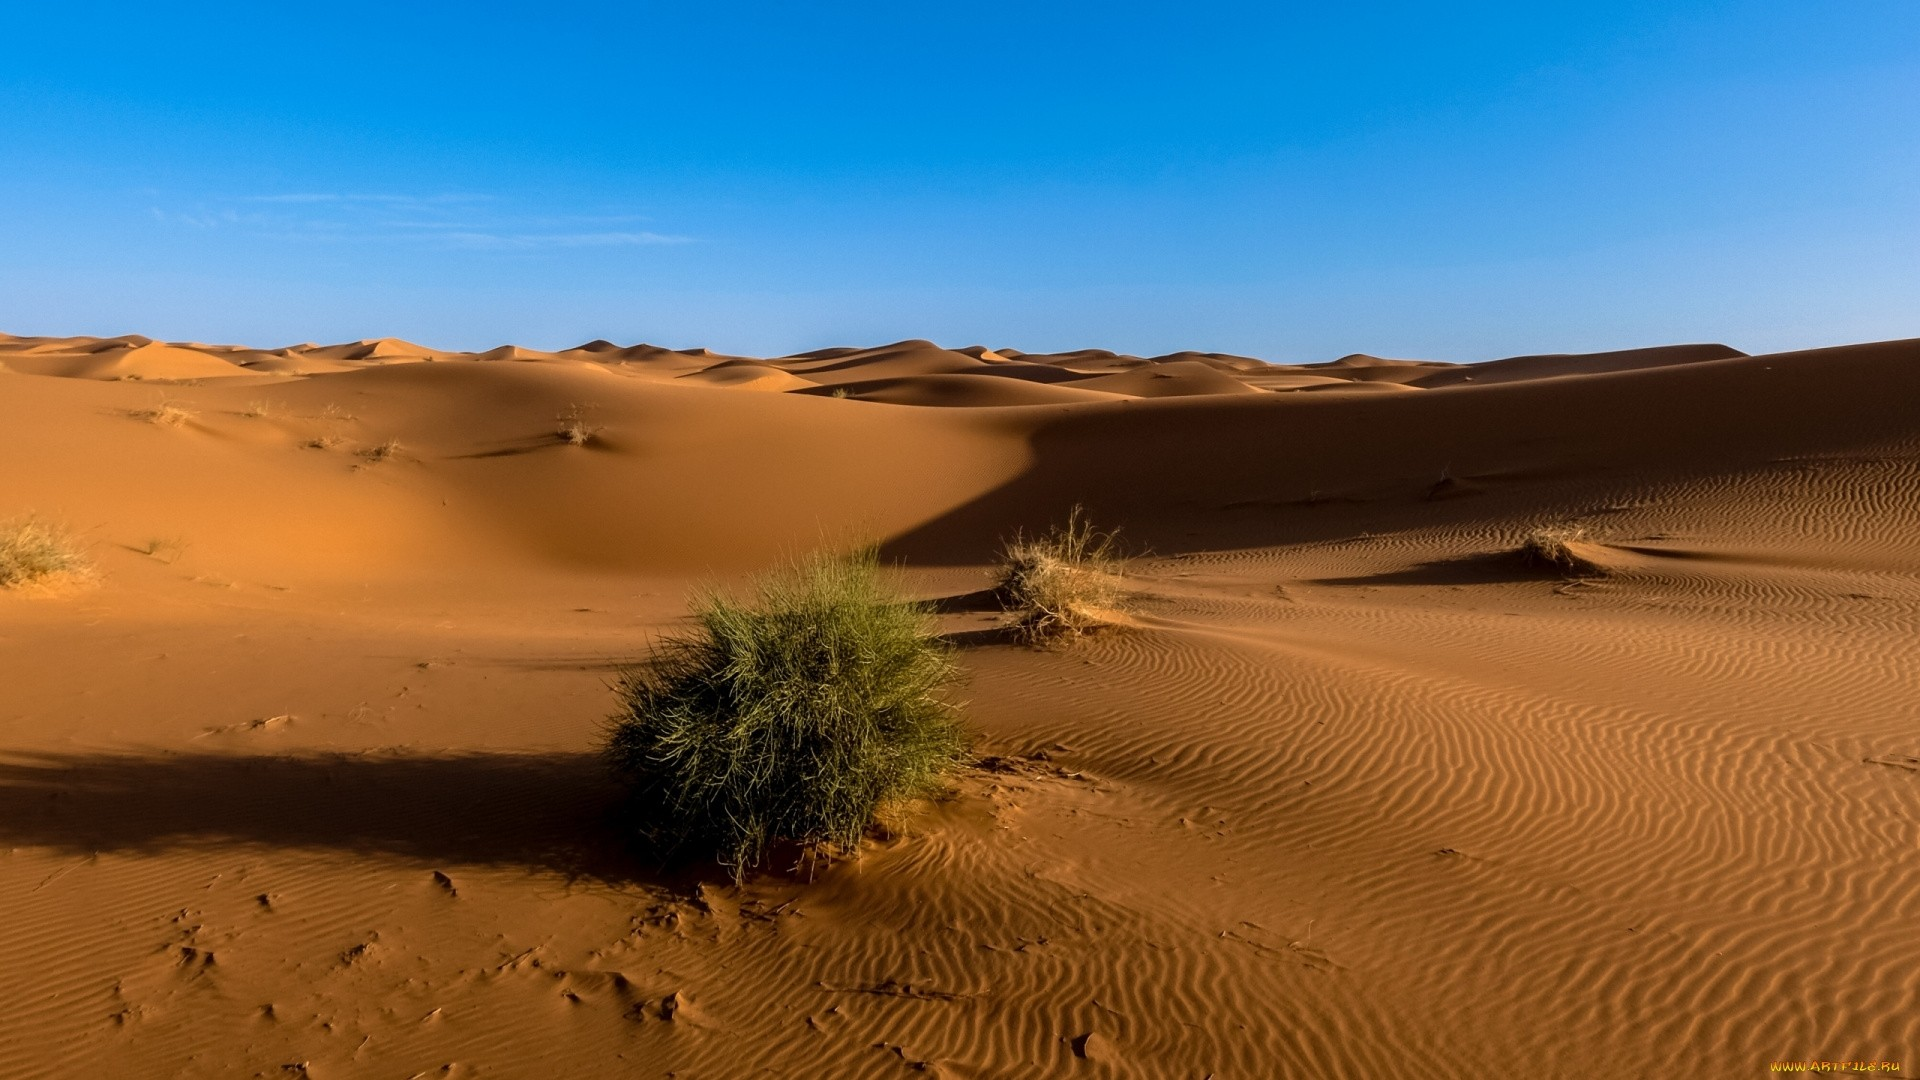 Sahara computer wallpaper